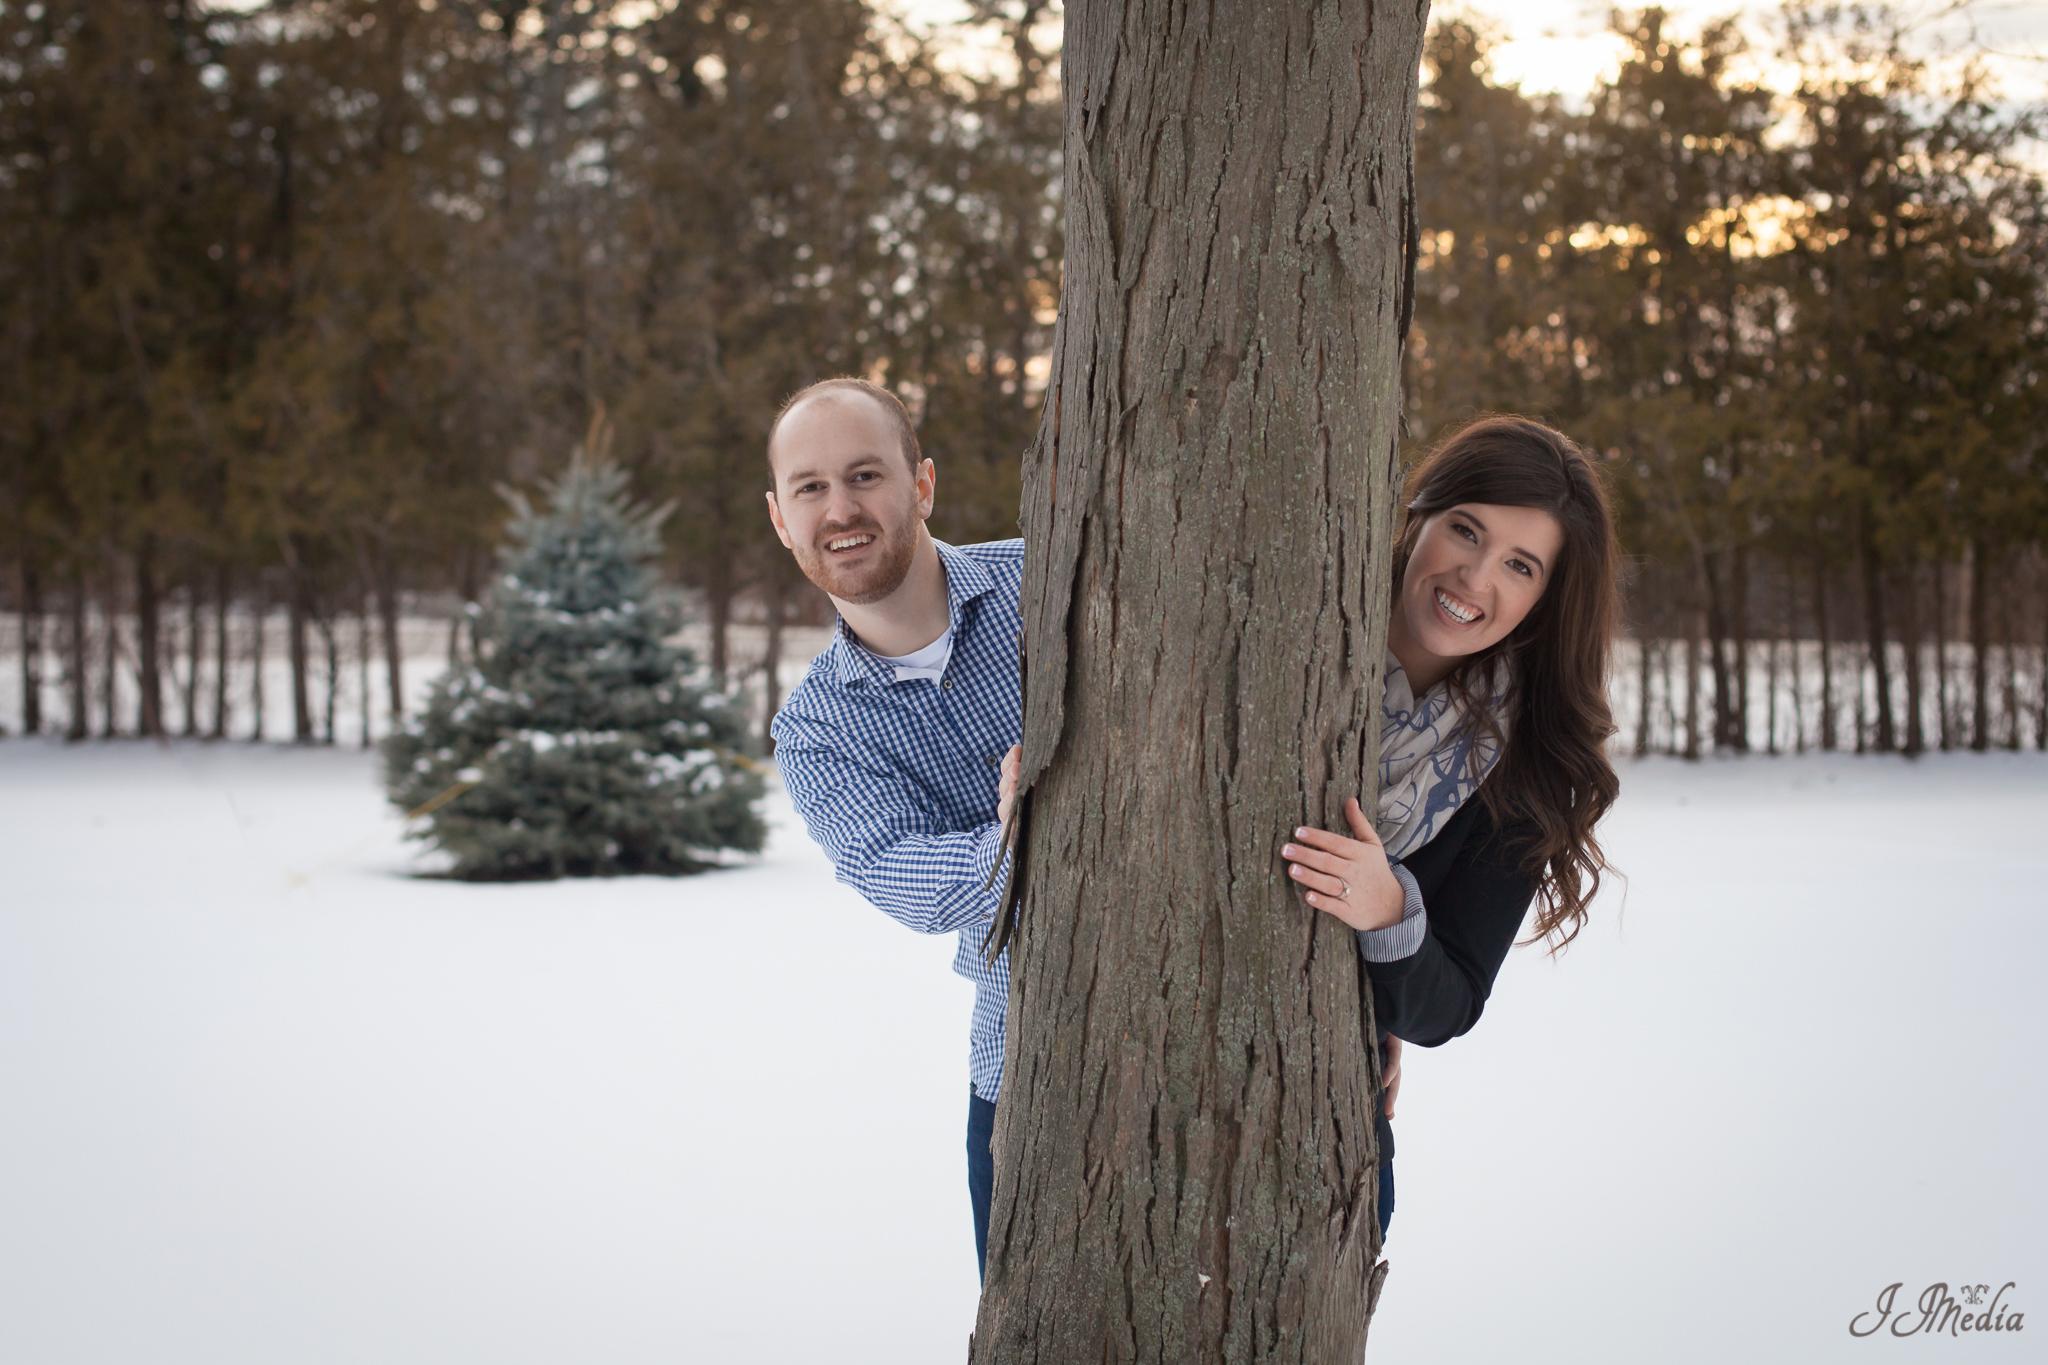 Winter-Engagement-Photos-JJMedia-28